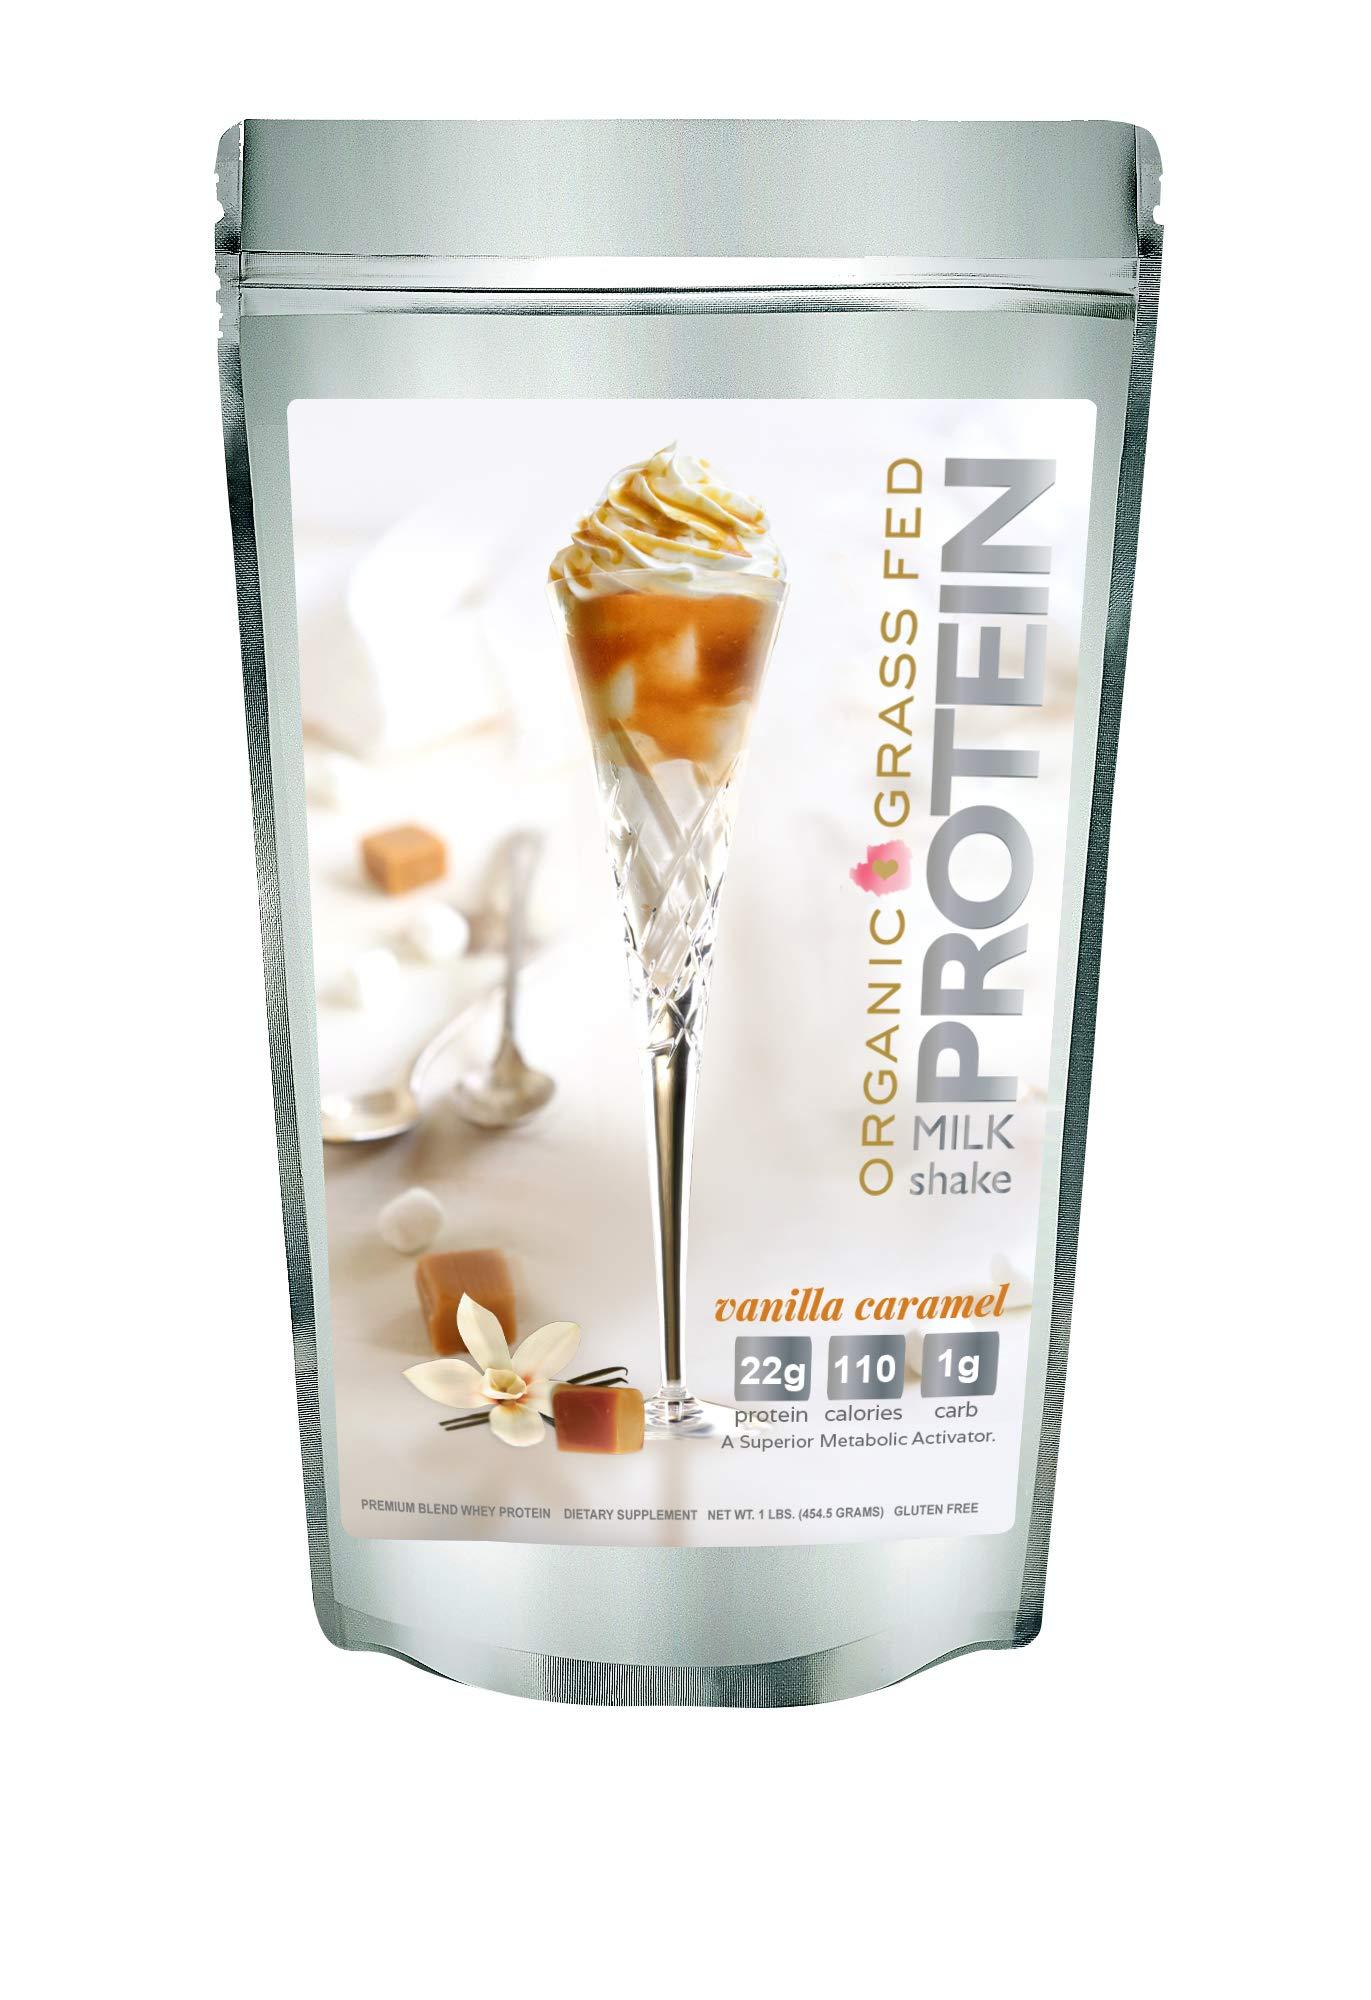 Protein Milkshake Low Carb Protein Powder - Vanilla Caramel 100% Premium Whey Protein, 15 Servings - 1 LB